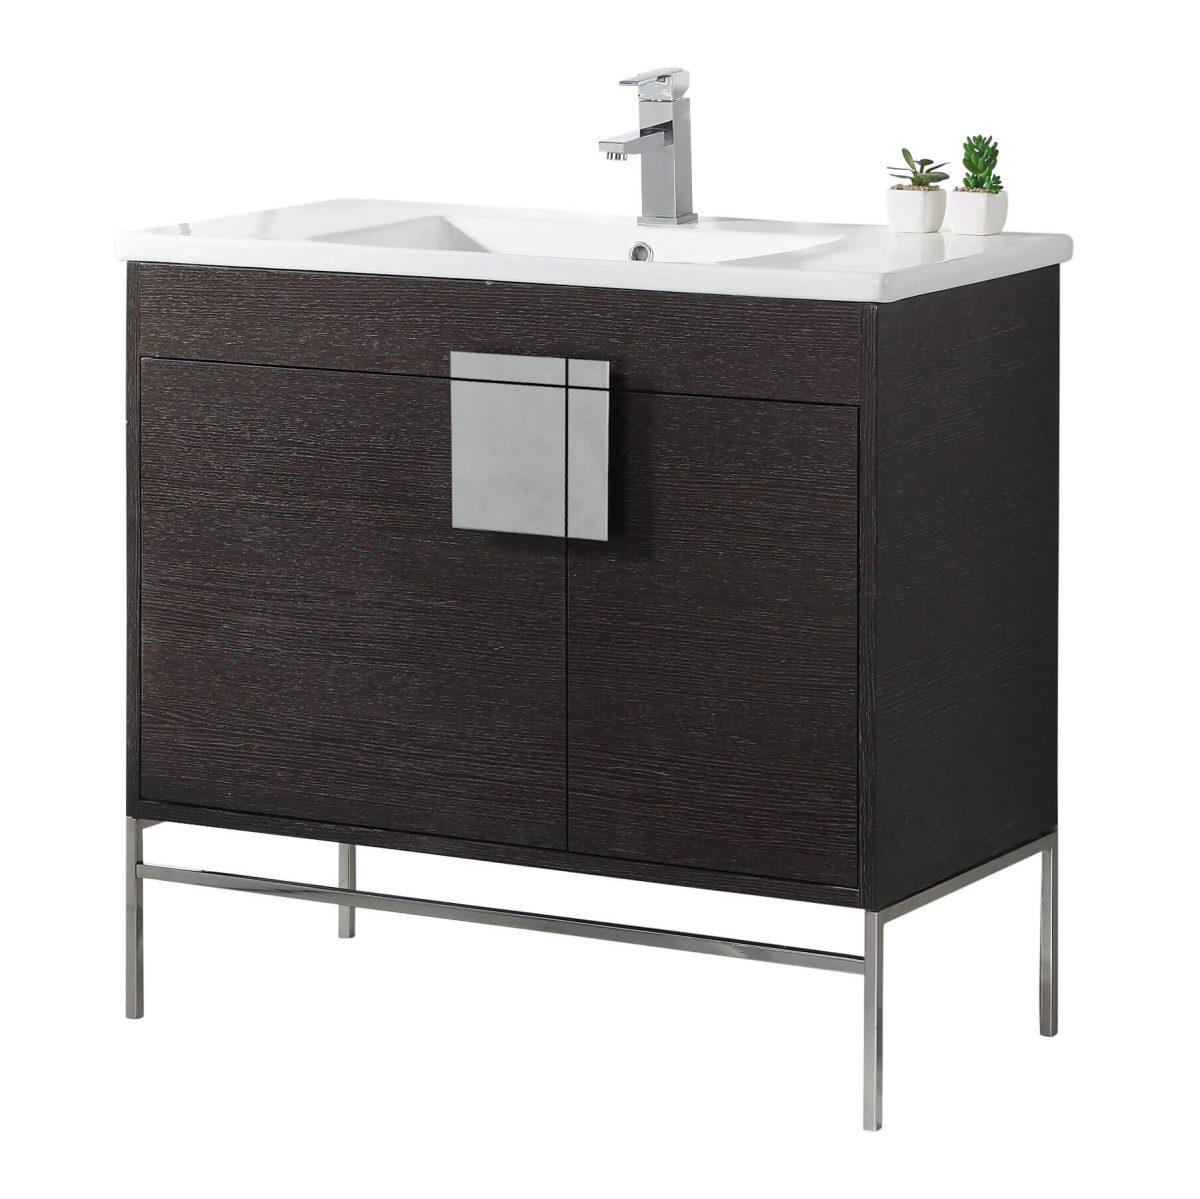 "Shawbridge 36"" Modern Bathroom Vanity  Black Oak Straight Grain with Polished Chrome Hardware"